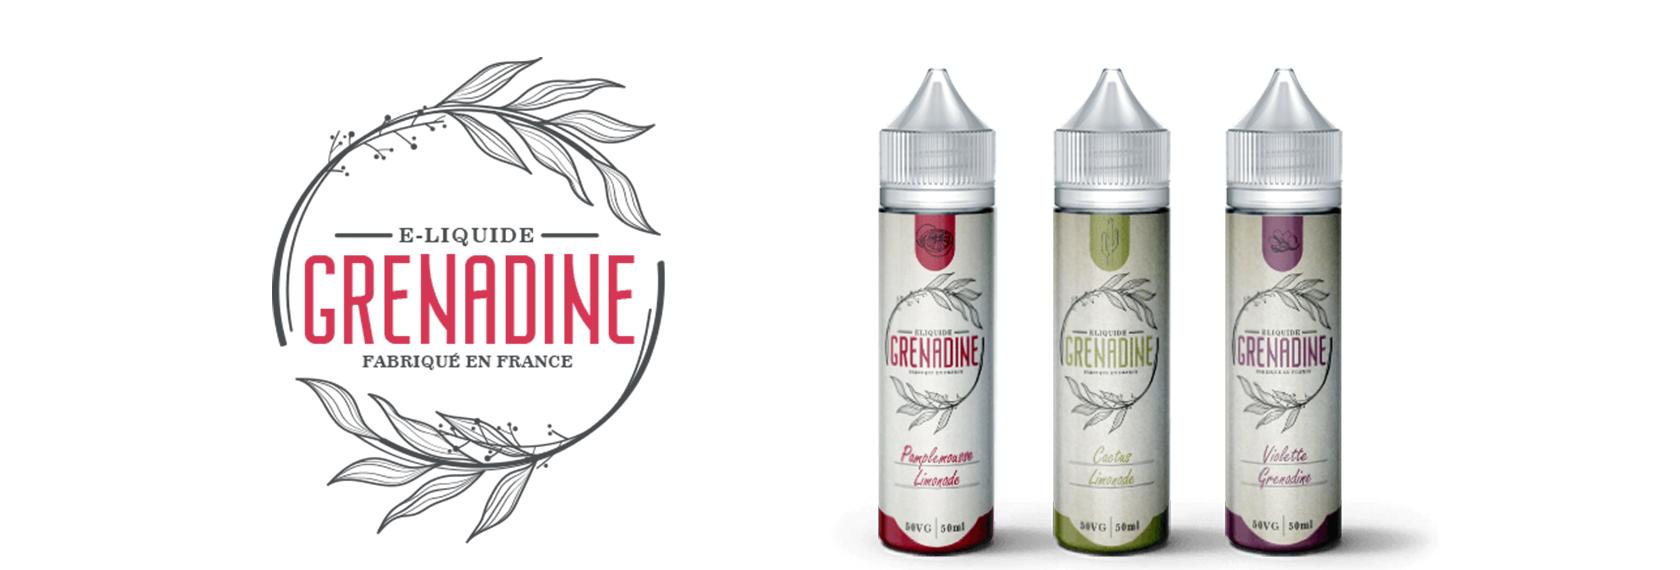 E-liquides J WELL 50ML au parfum GRENADINE